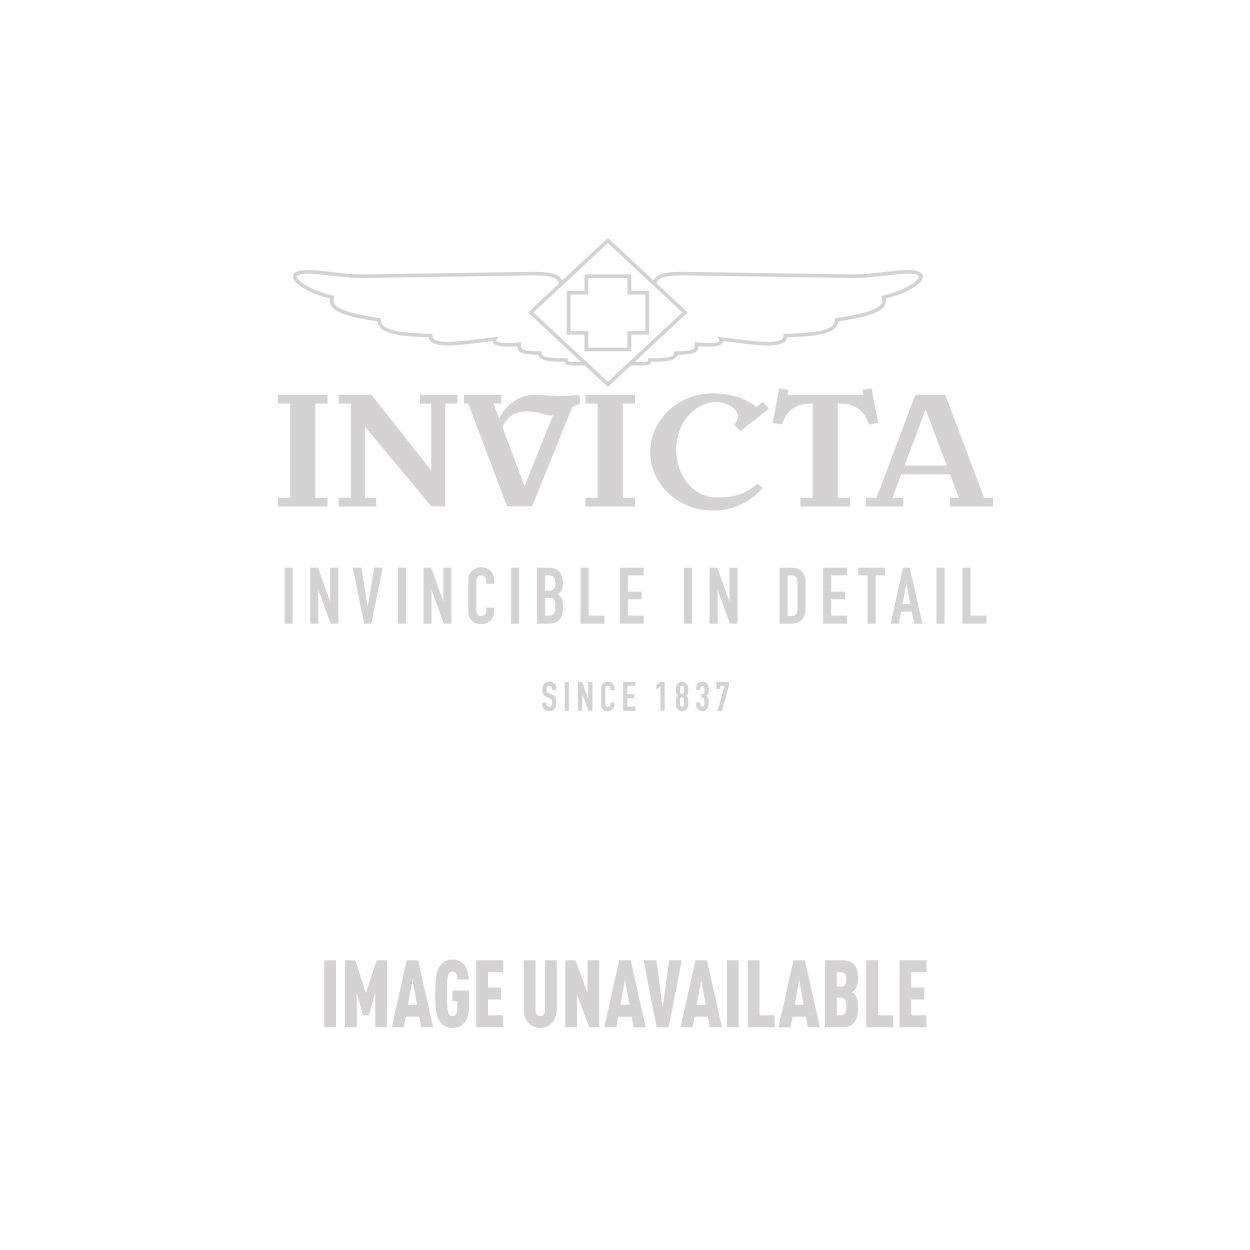 6a487bcc5 Invicta Pro Diver SCUBA Men's Quartz Stainless Steel Case, Blue Dial -  22339 - Official Invicta Store